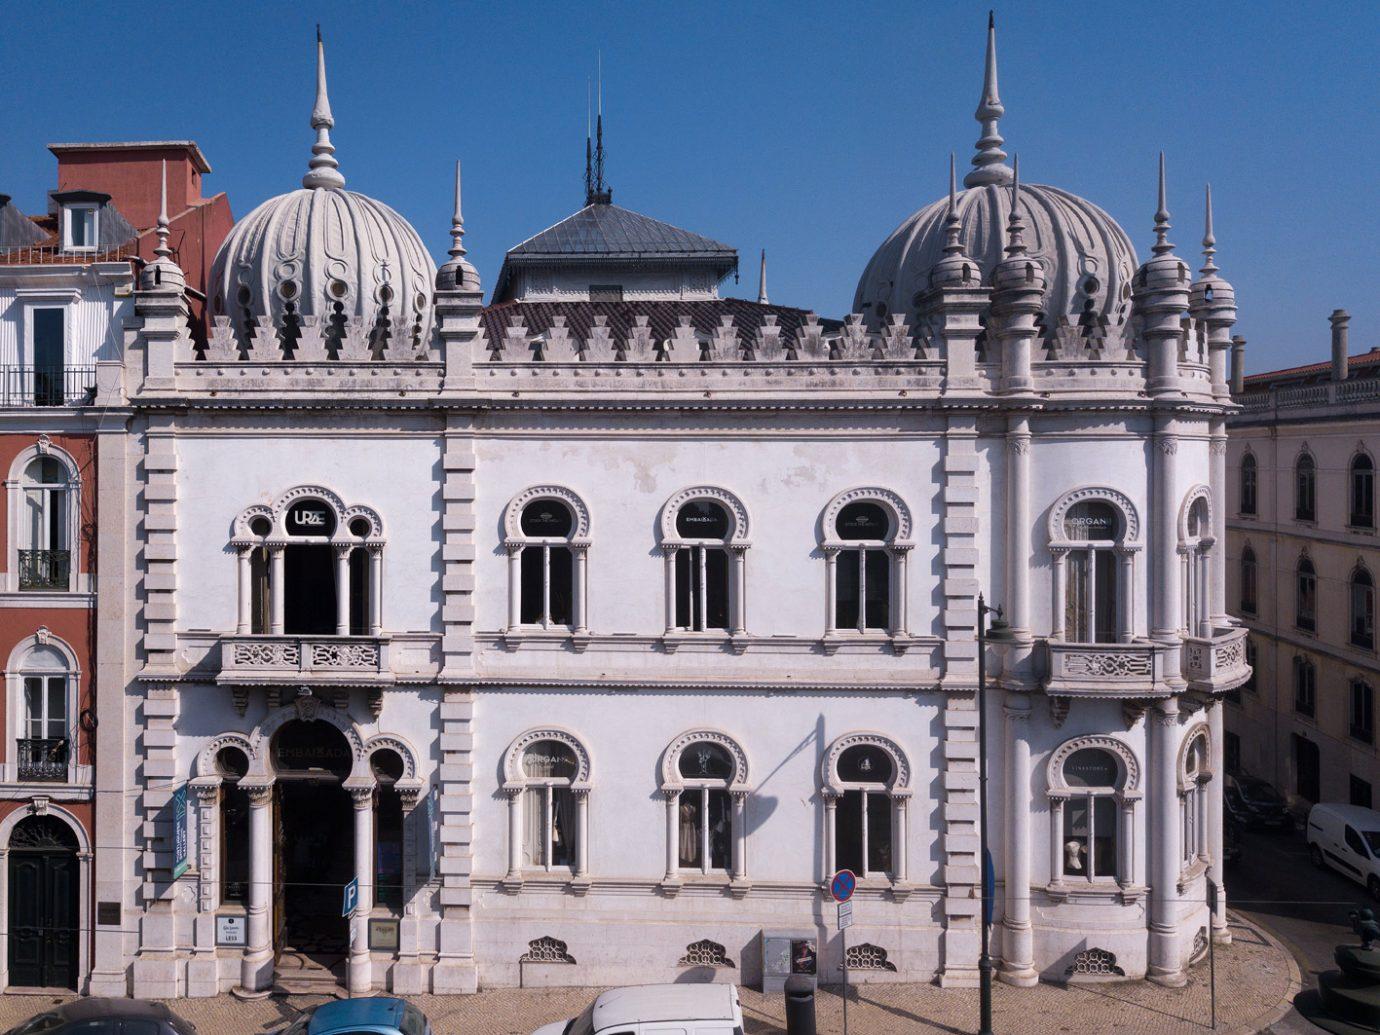 Exterior of Embaixada